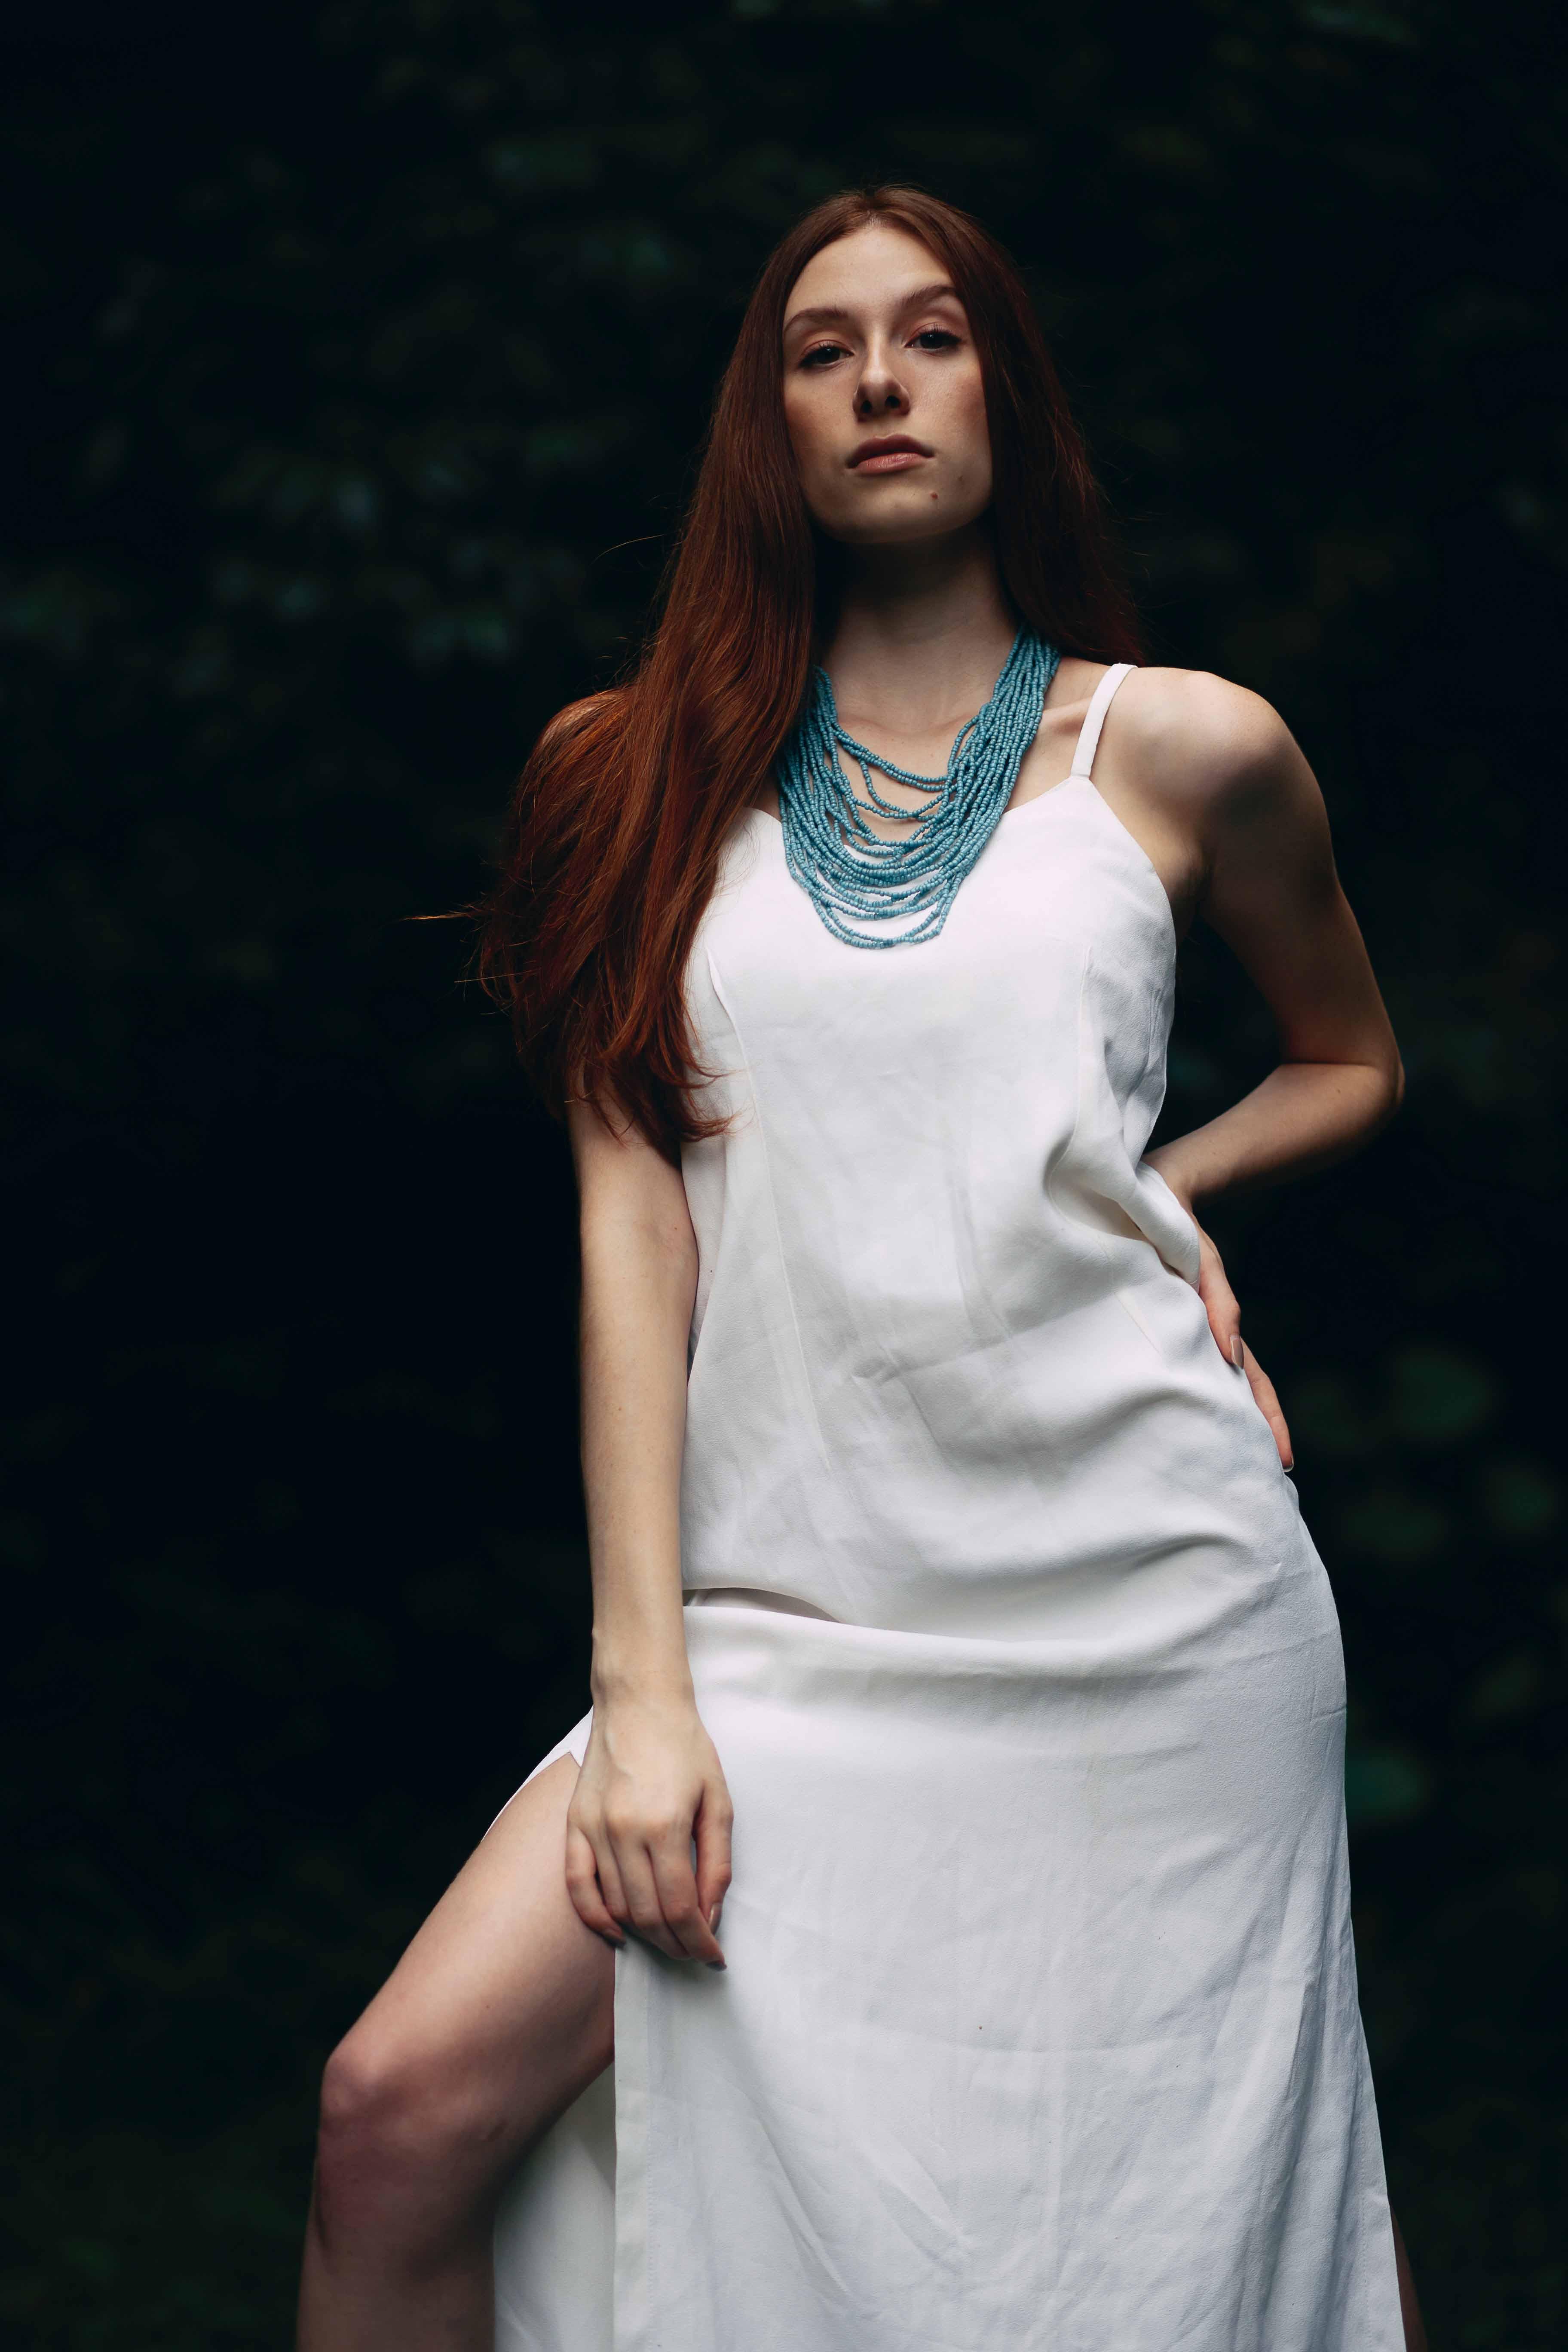 Kennington escorts - hot redhead in white skirt